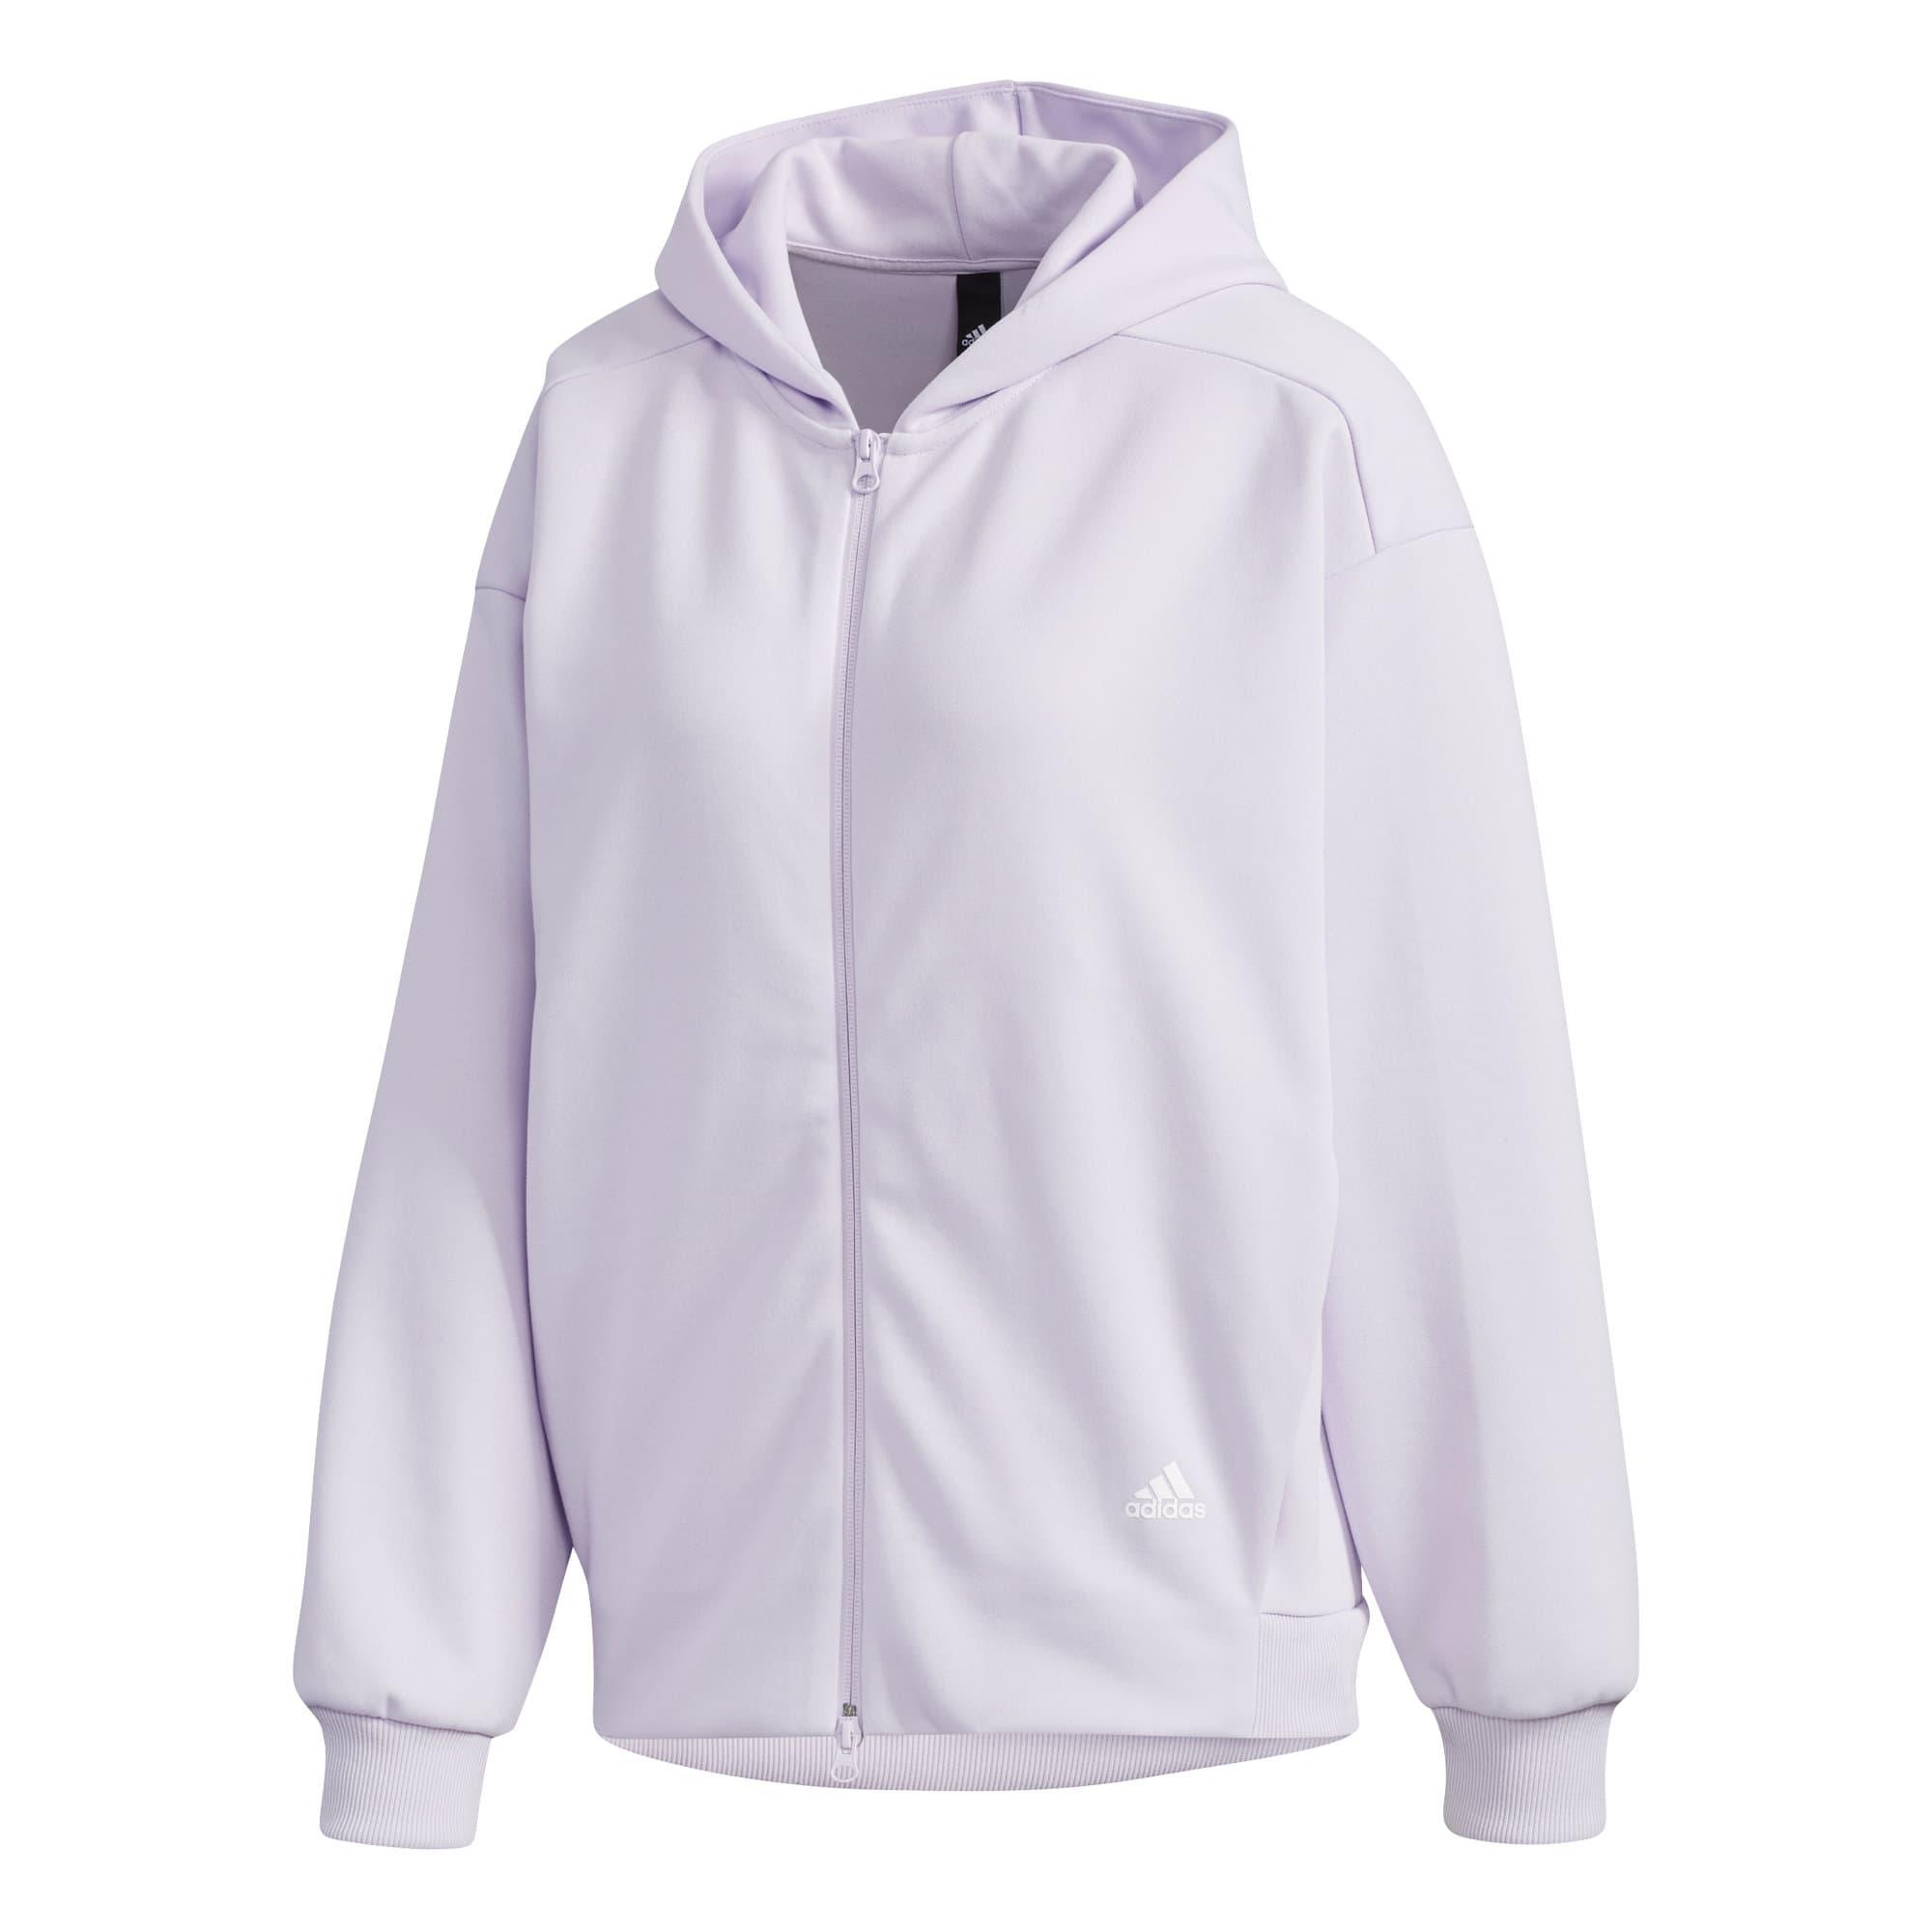 sweat shirt adidas femme